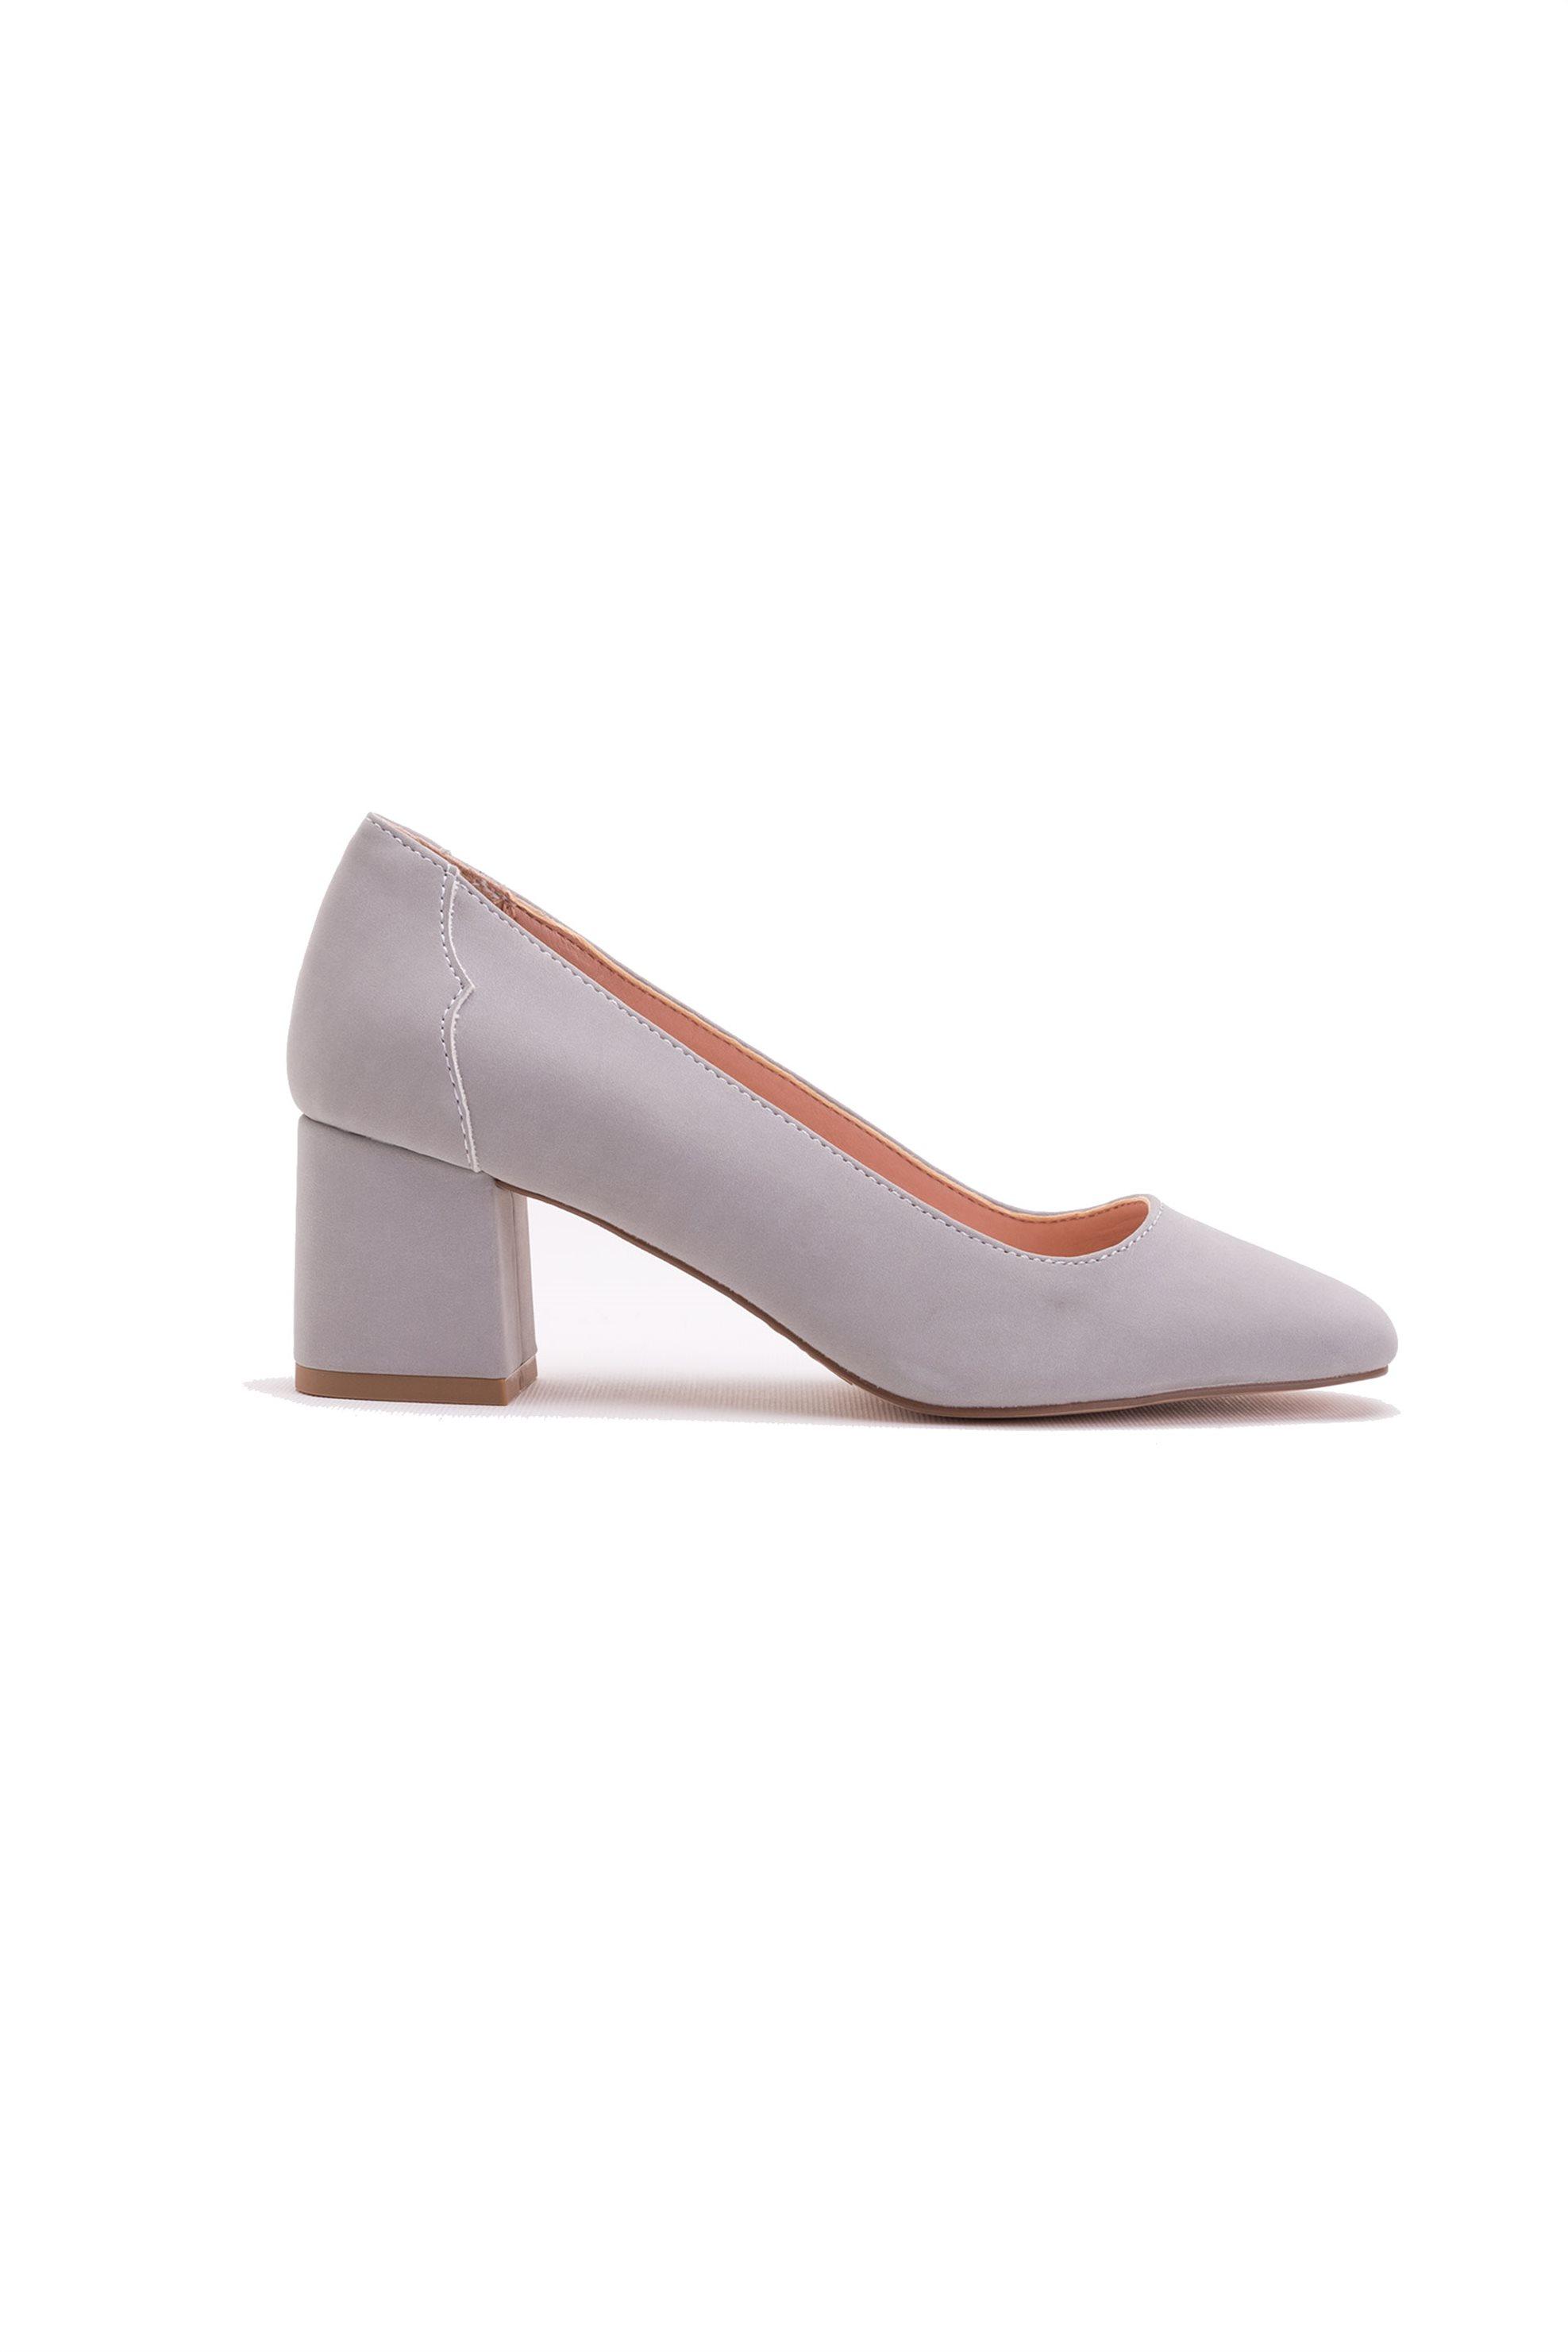 63b88b1ac1a Notos Γυναικεία παπούτσια Esprit – 018EK1W010 – Γκρι